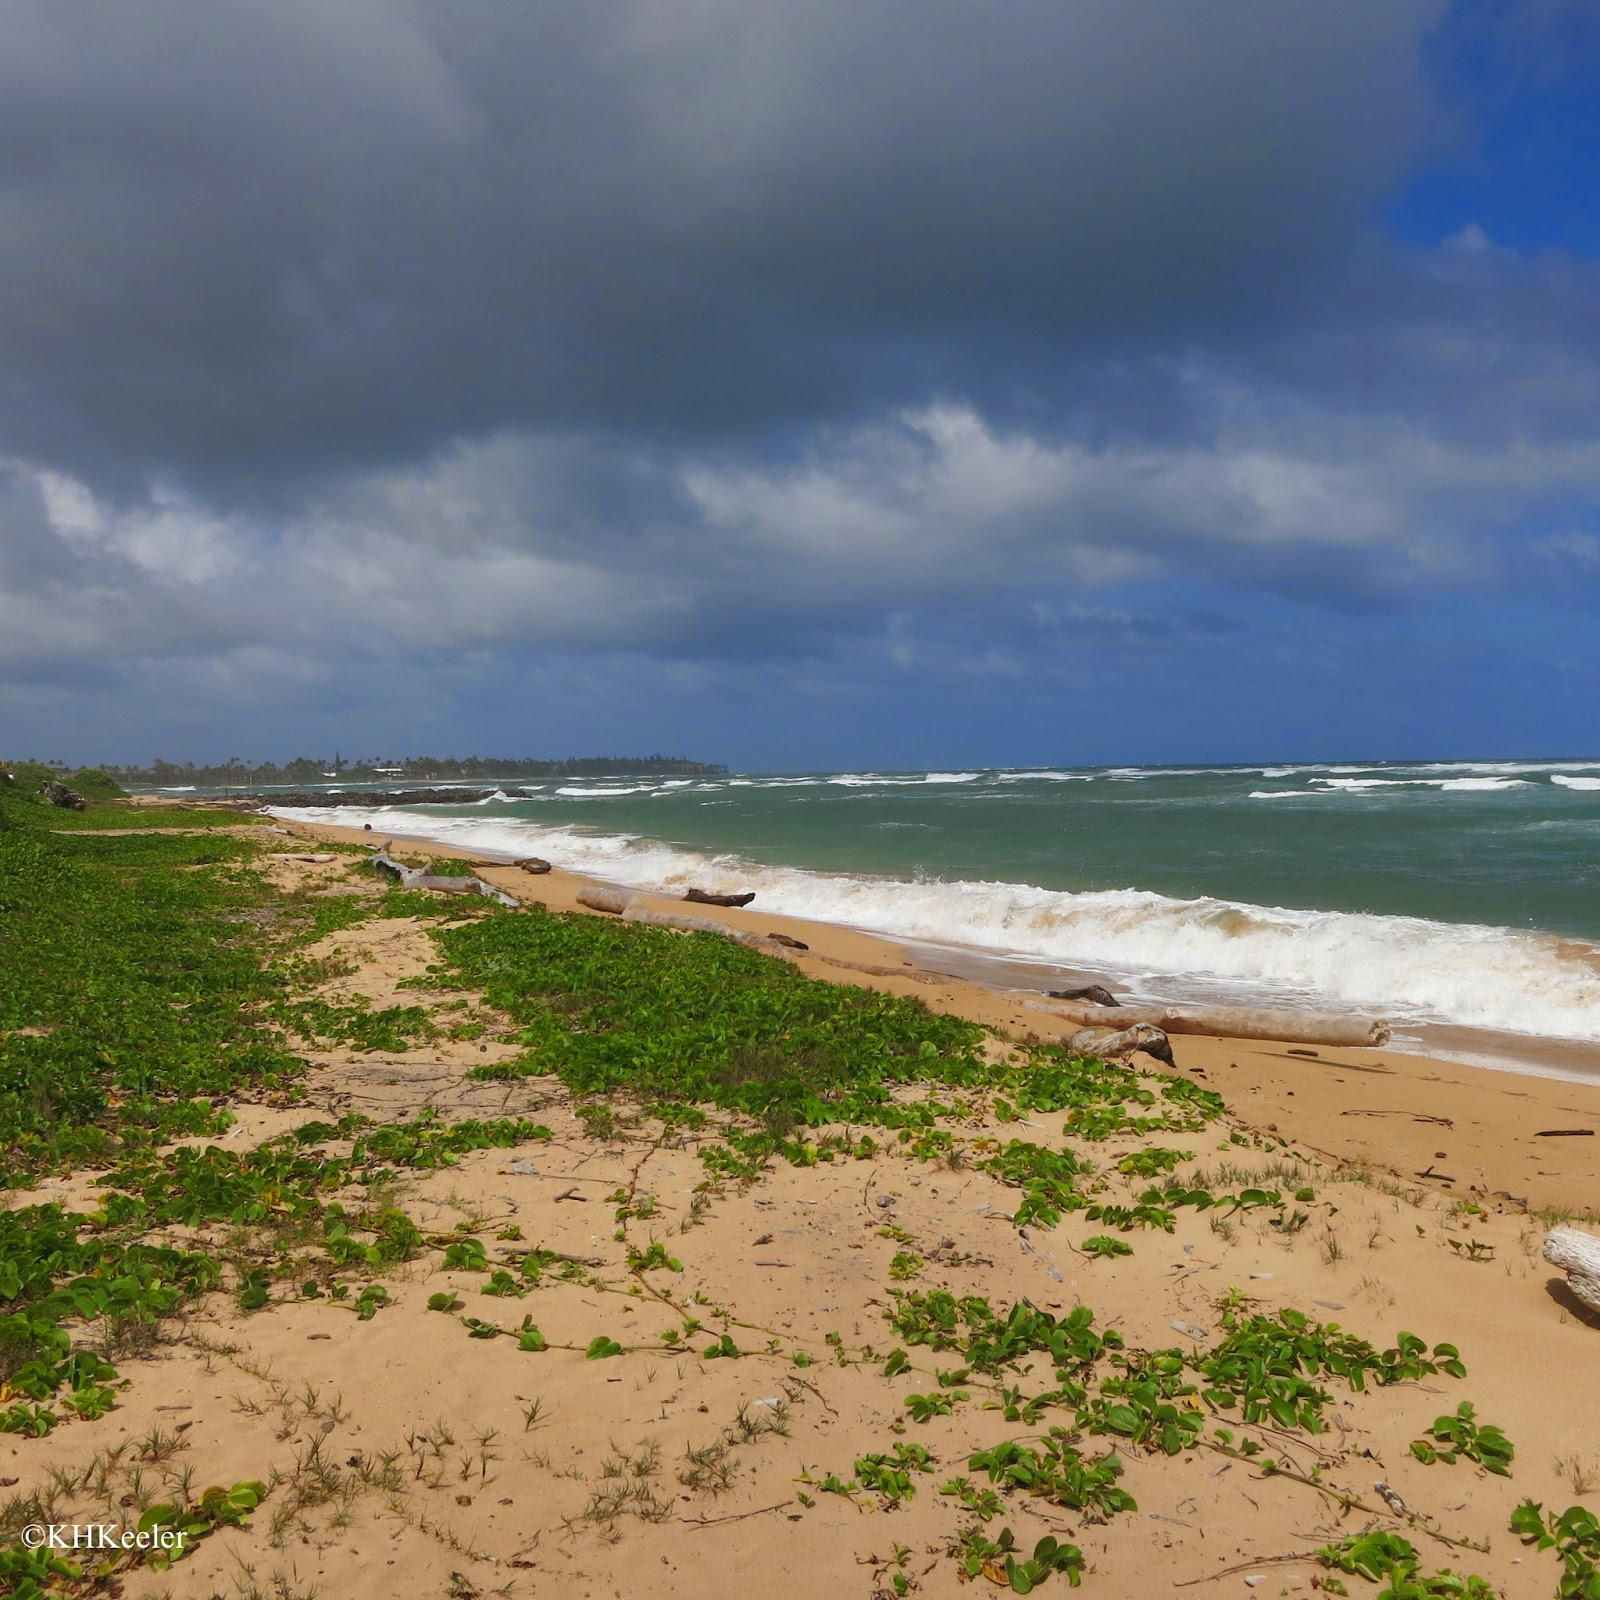 Kauai Beach: A Wandering Botanist: Visiting Kauai